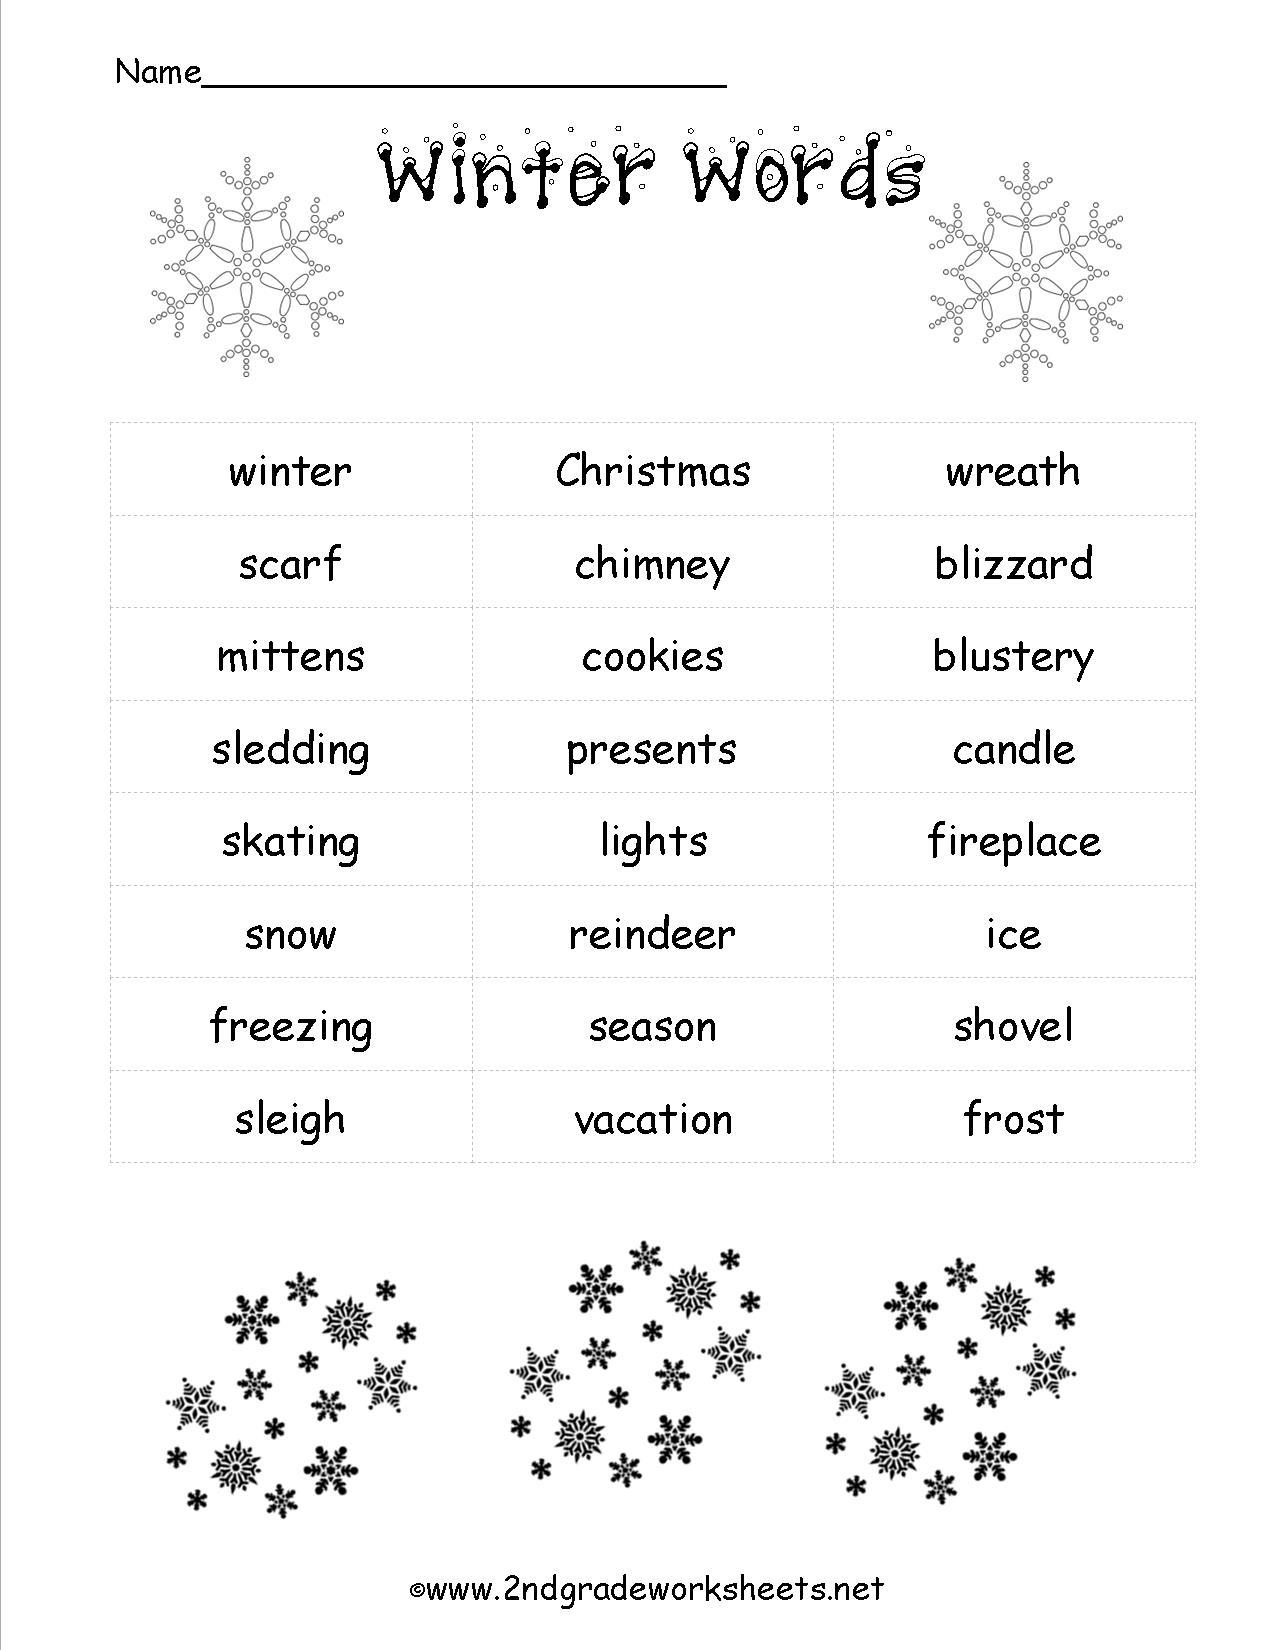 Christmas Worksheets And Printouts | Christmas Fun Worksheets Printable Free